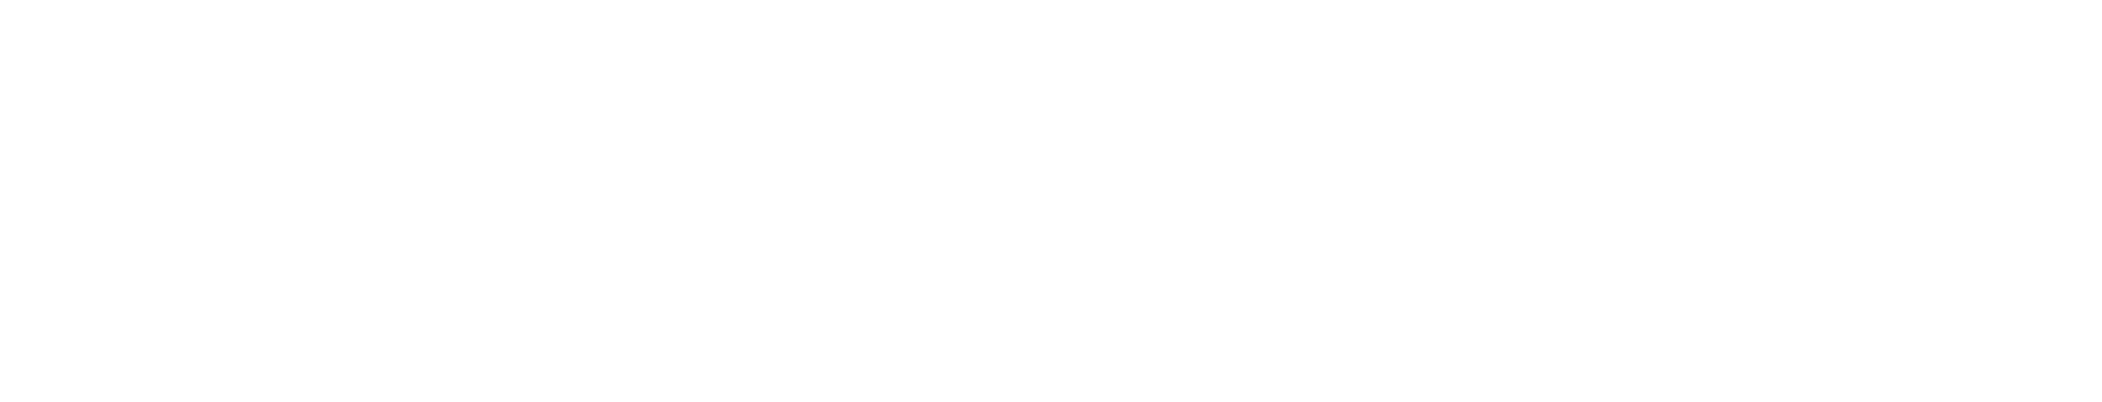 boites-mails-icone